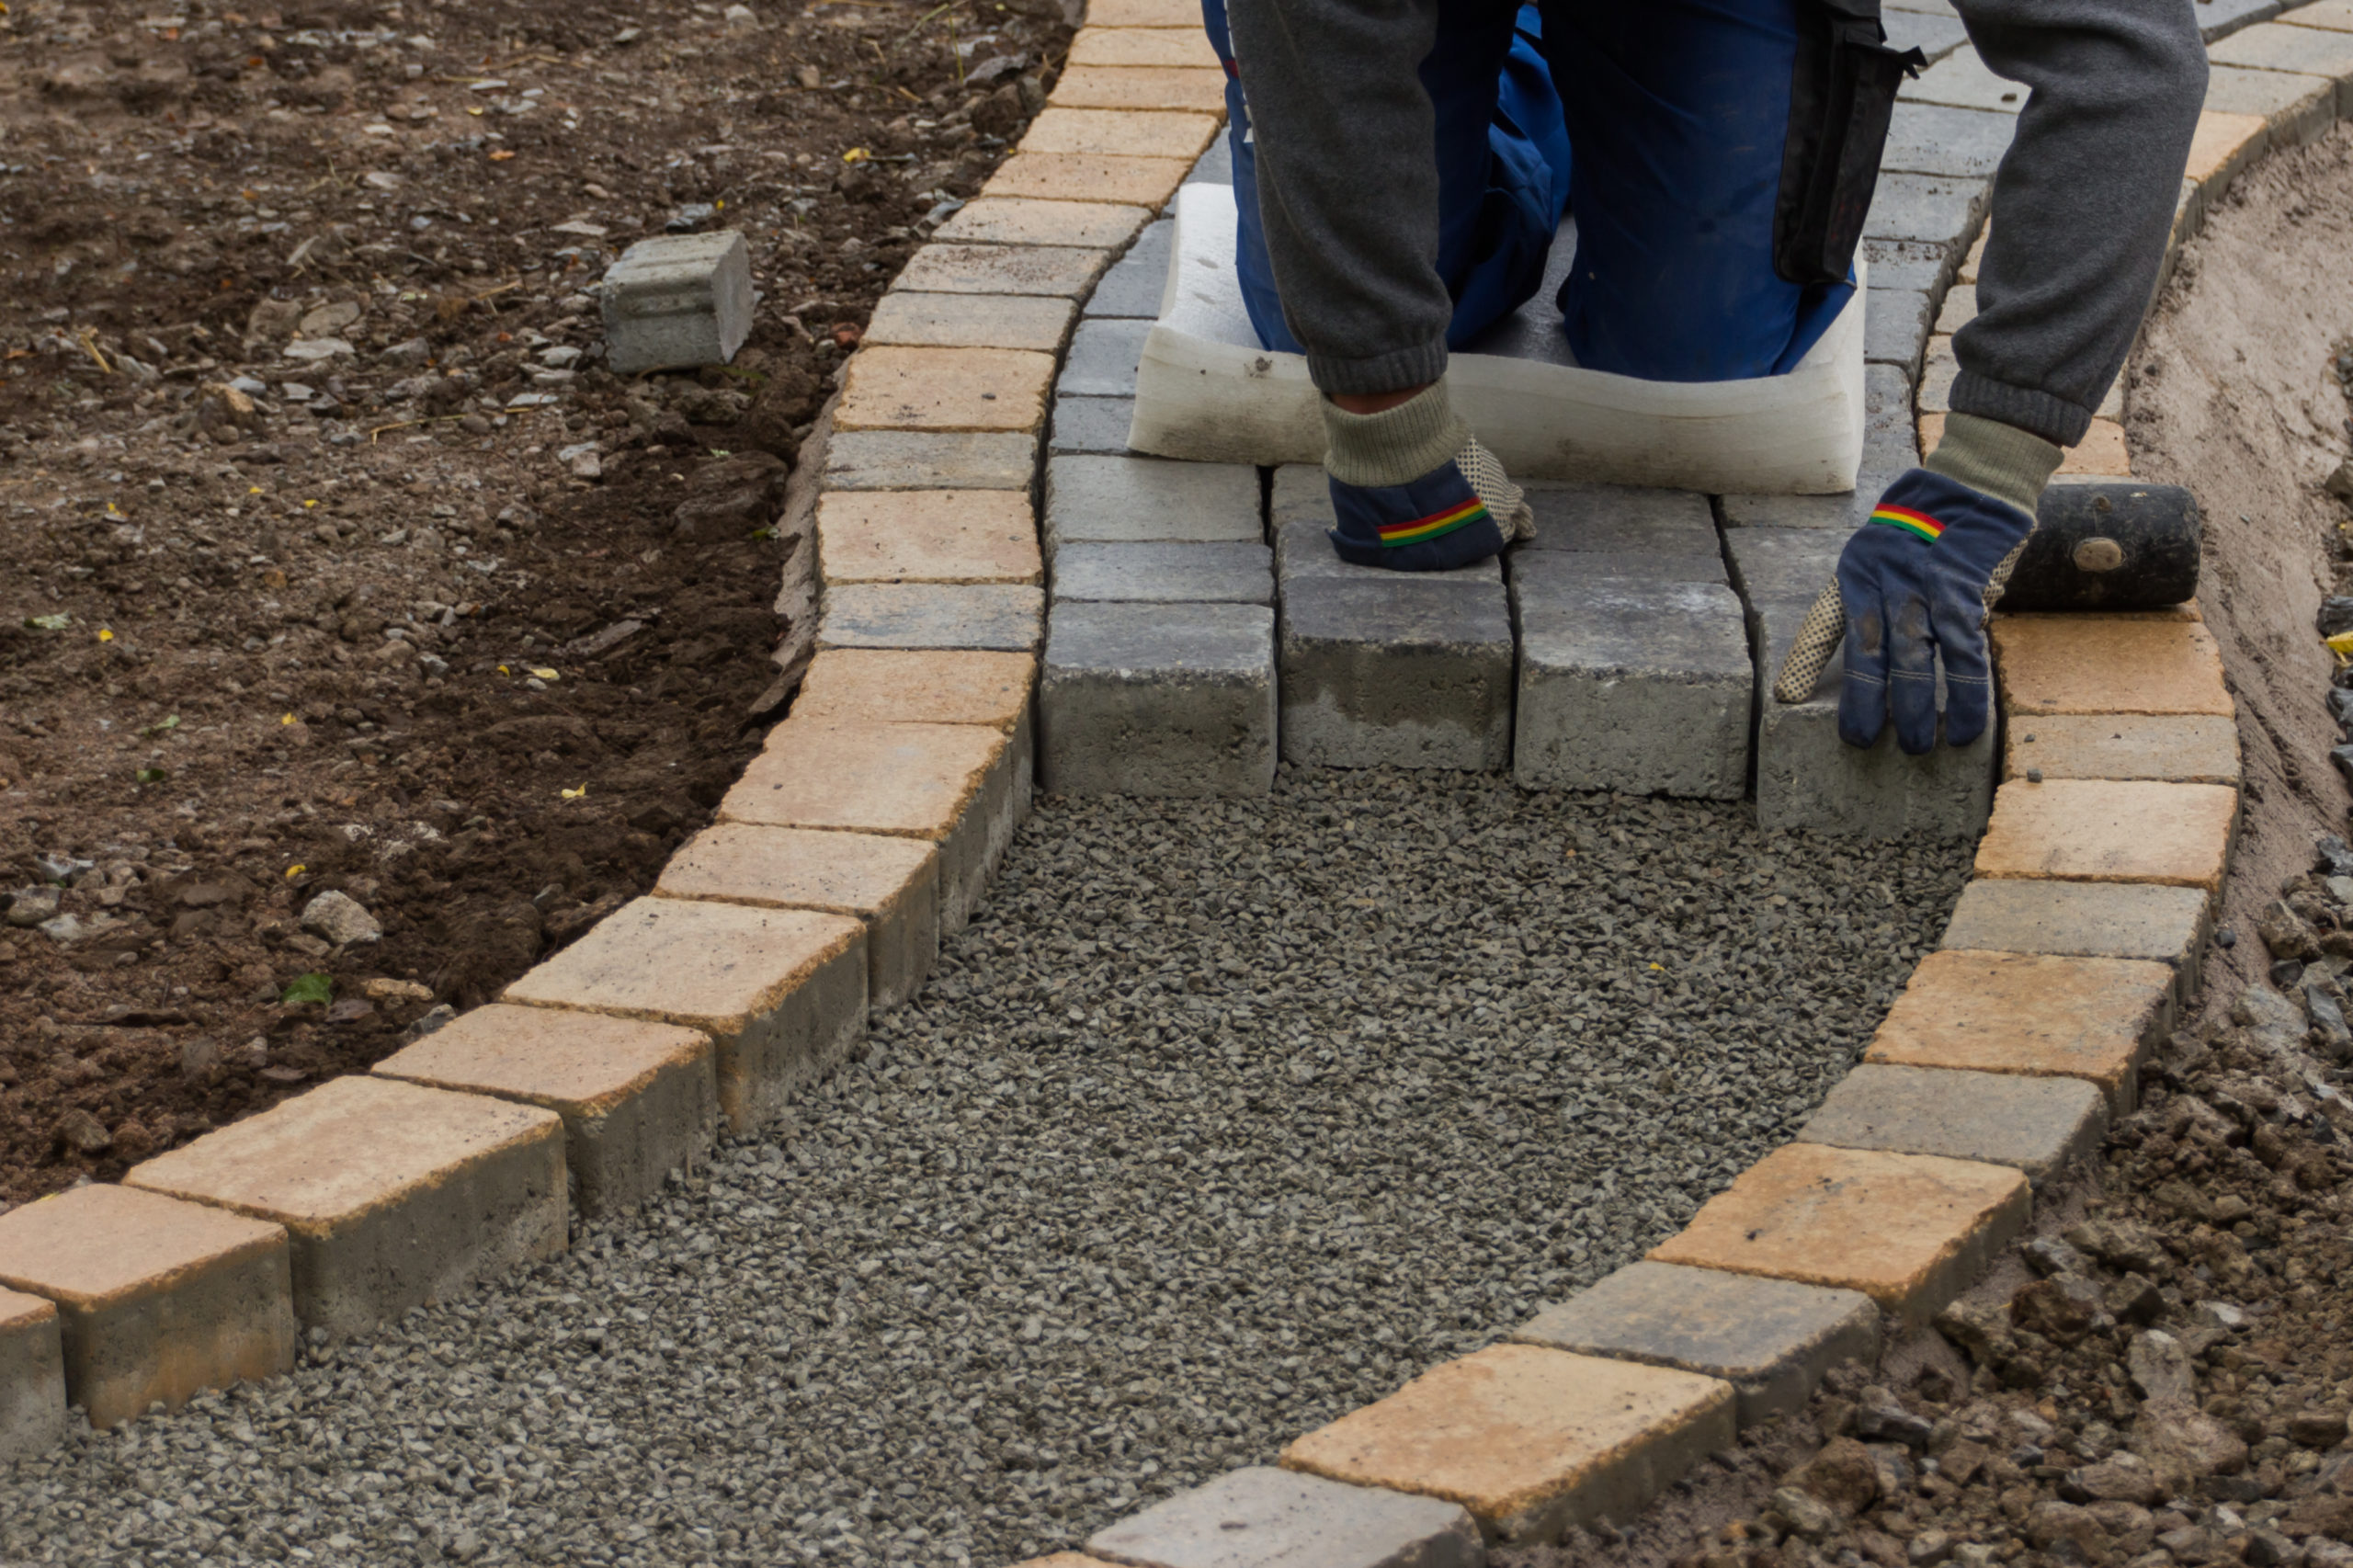 Landscaping & External Works